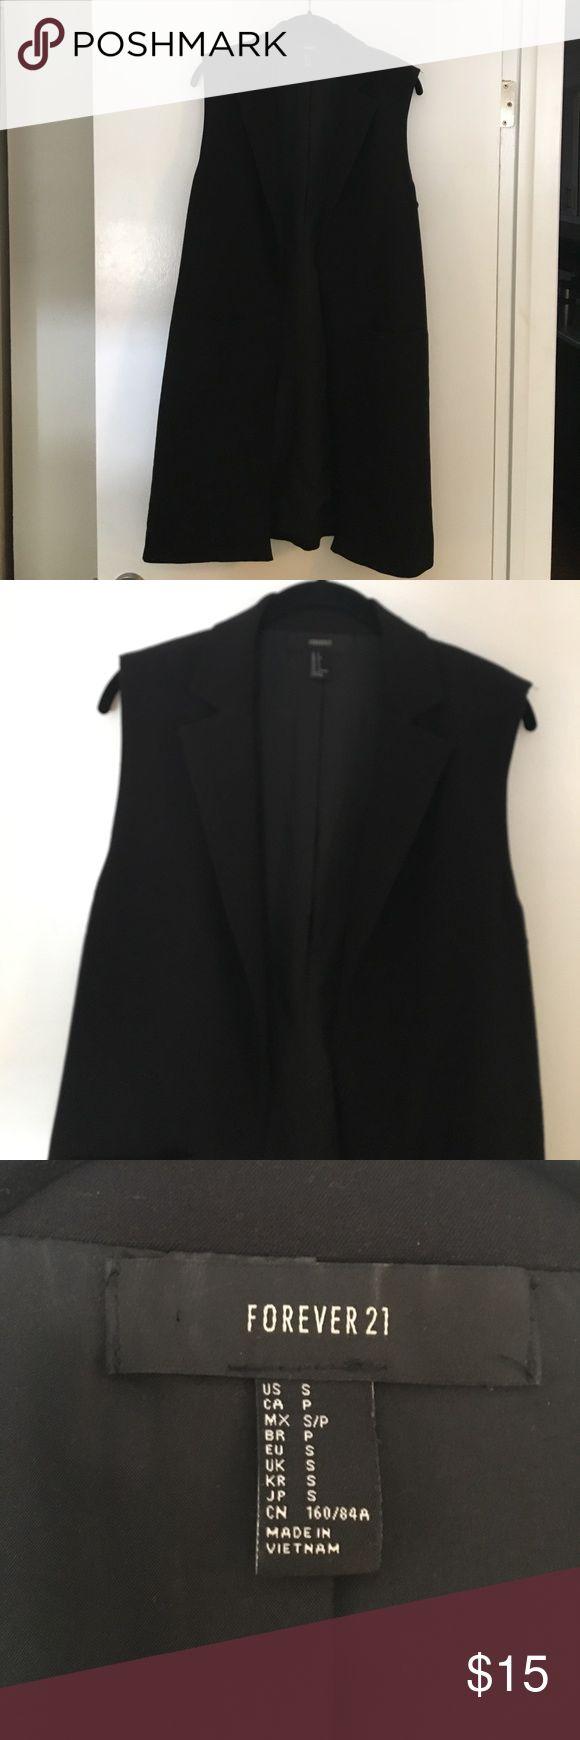 Long work vest Super cute long open vest. Looks great with